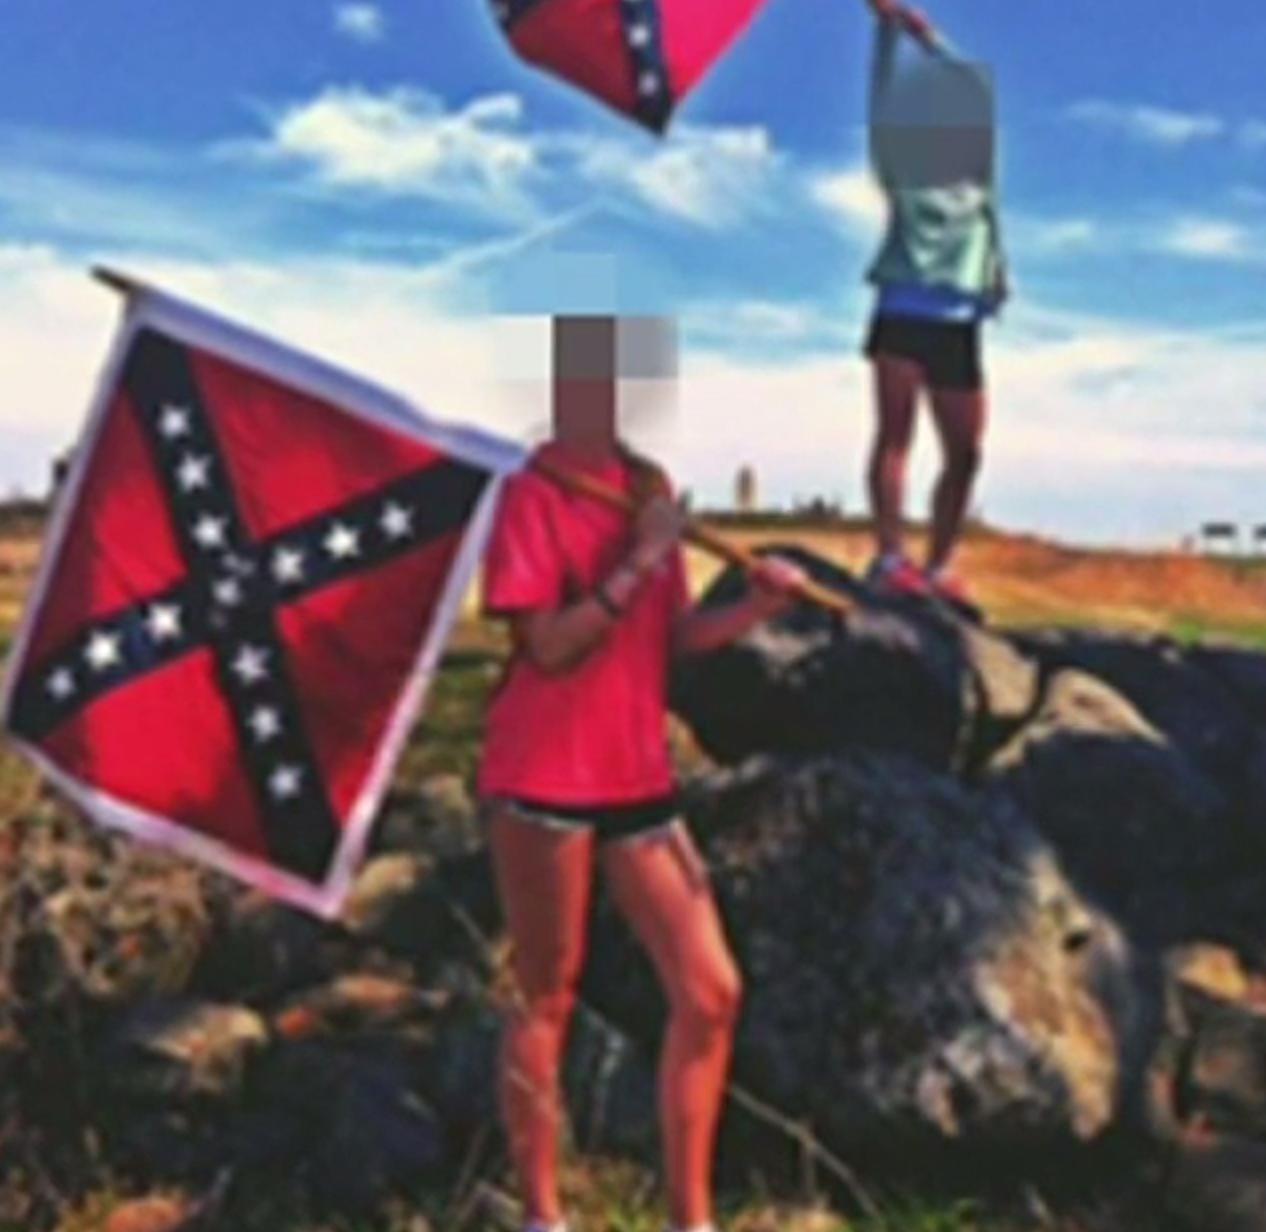 rebel-flag-instagram-chapel-hill-students